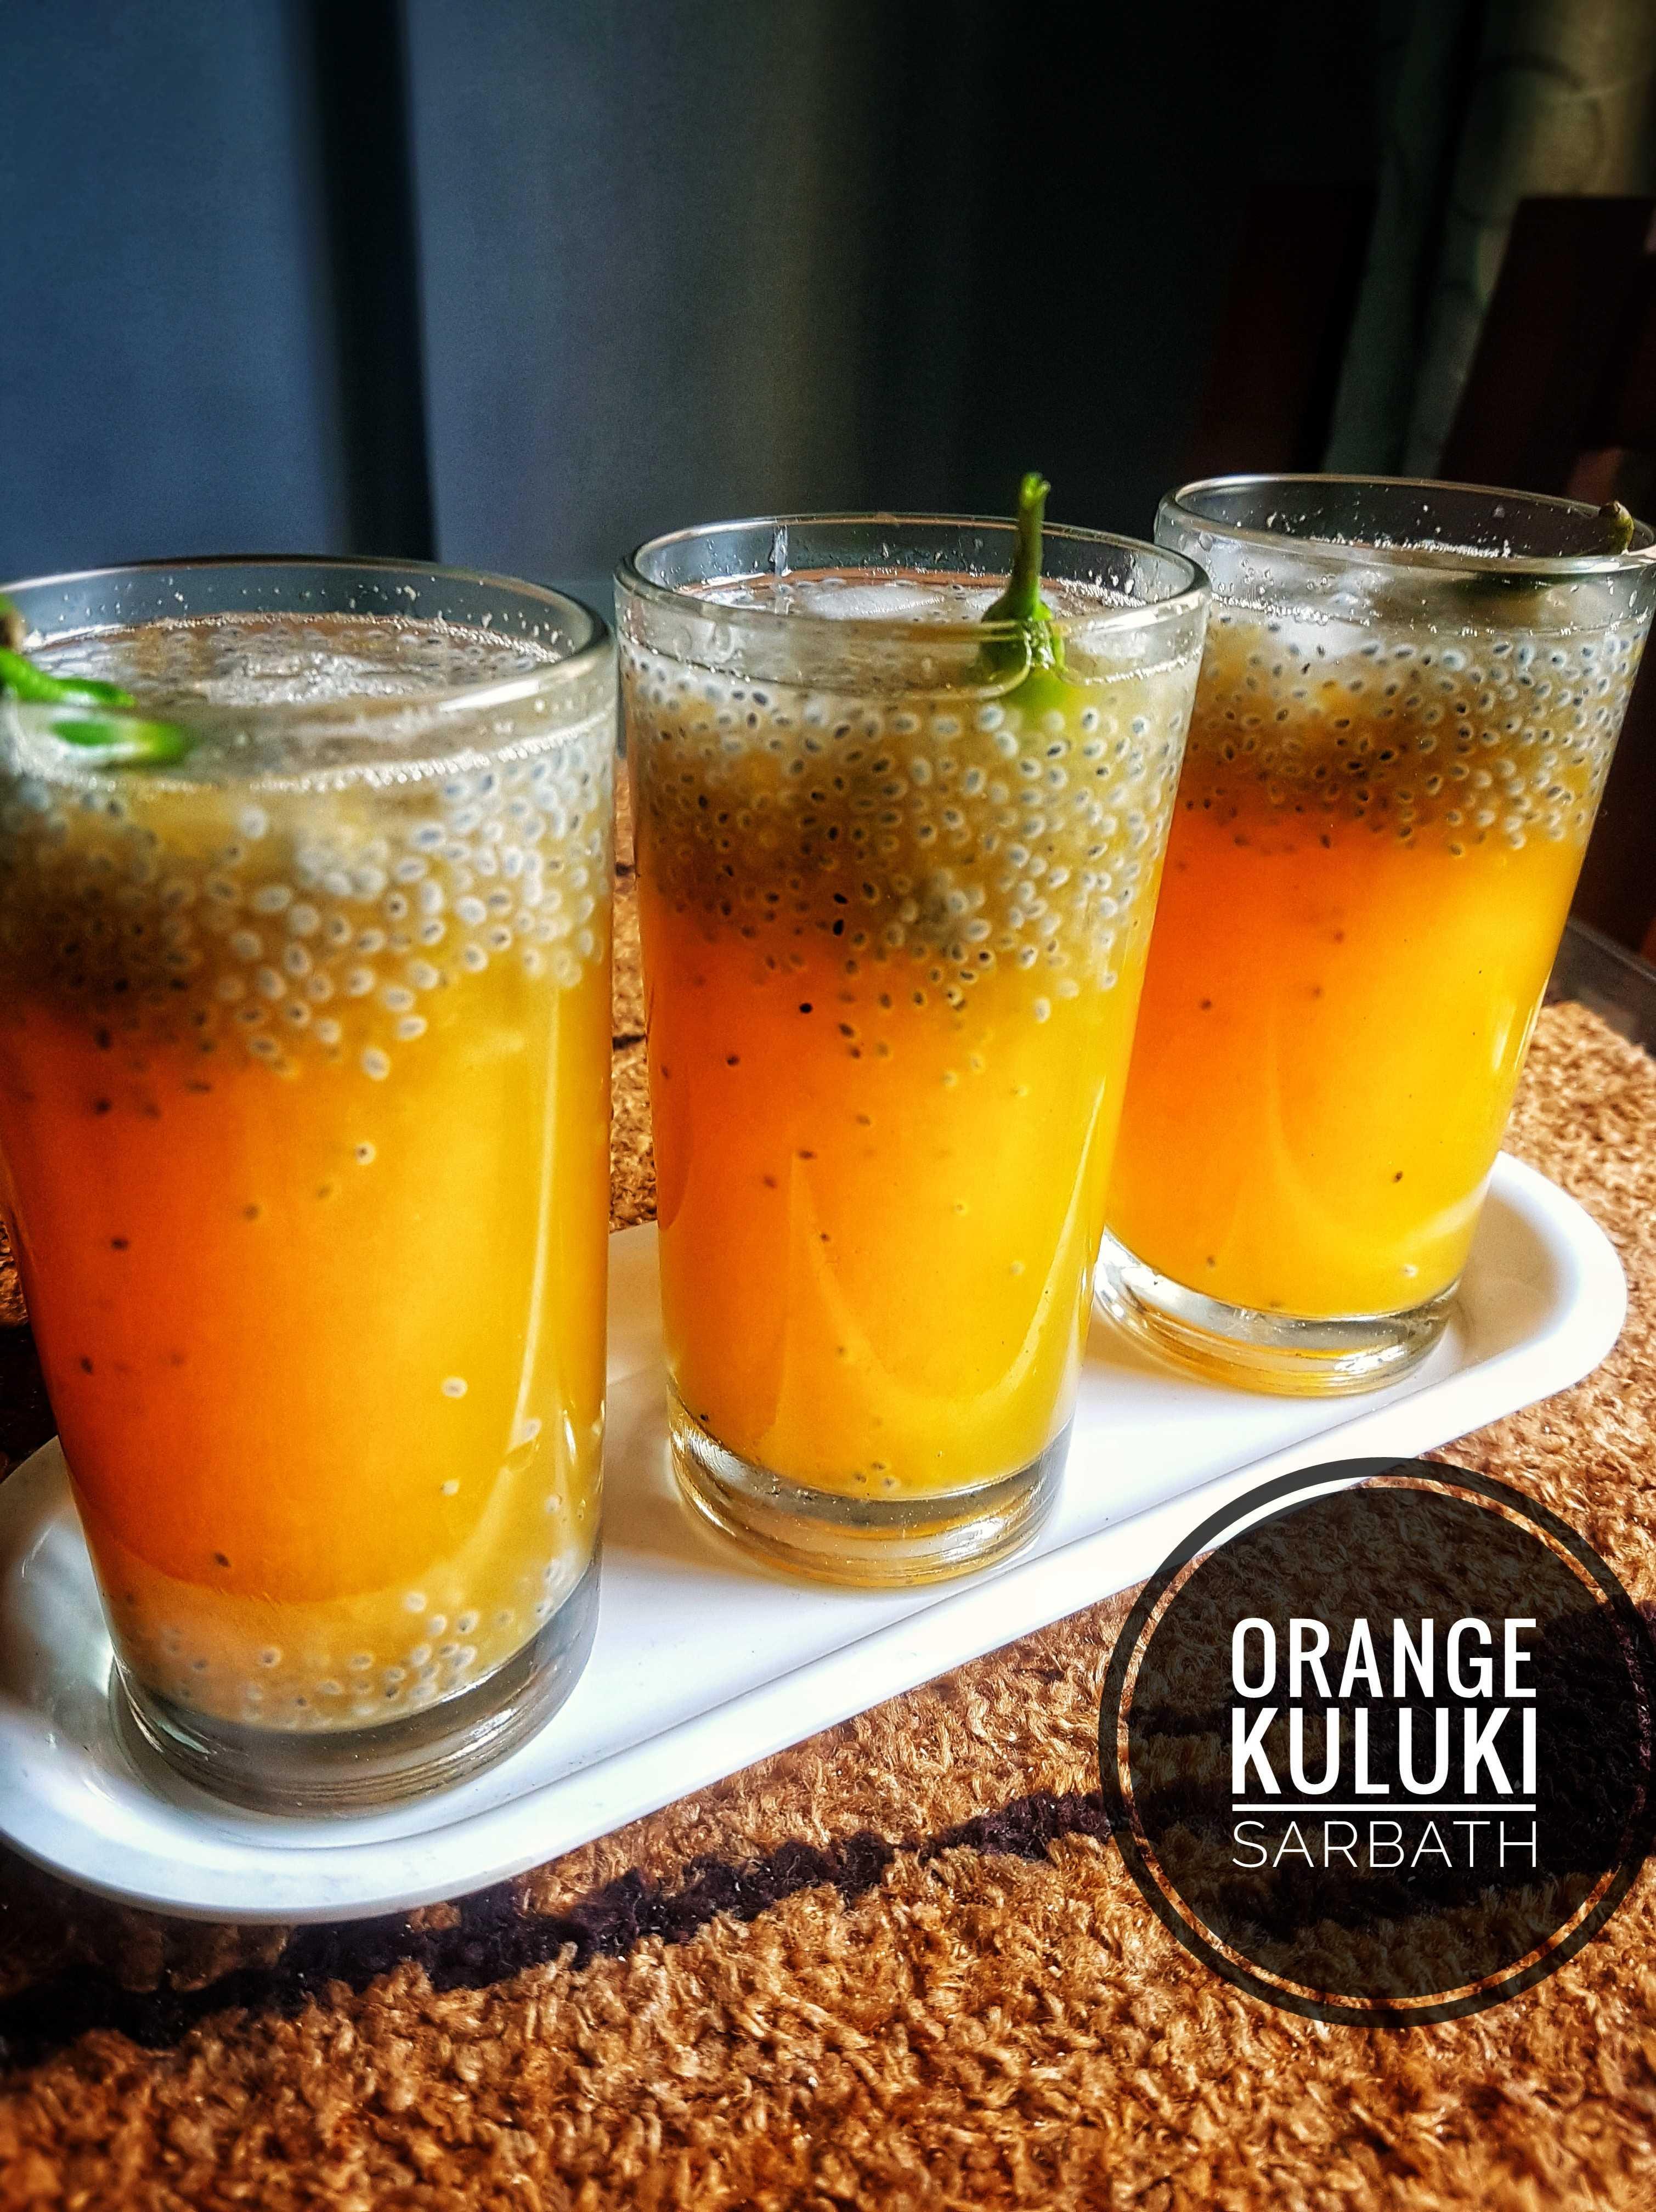 Orange Kuluki Sarbath